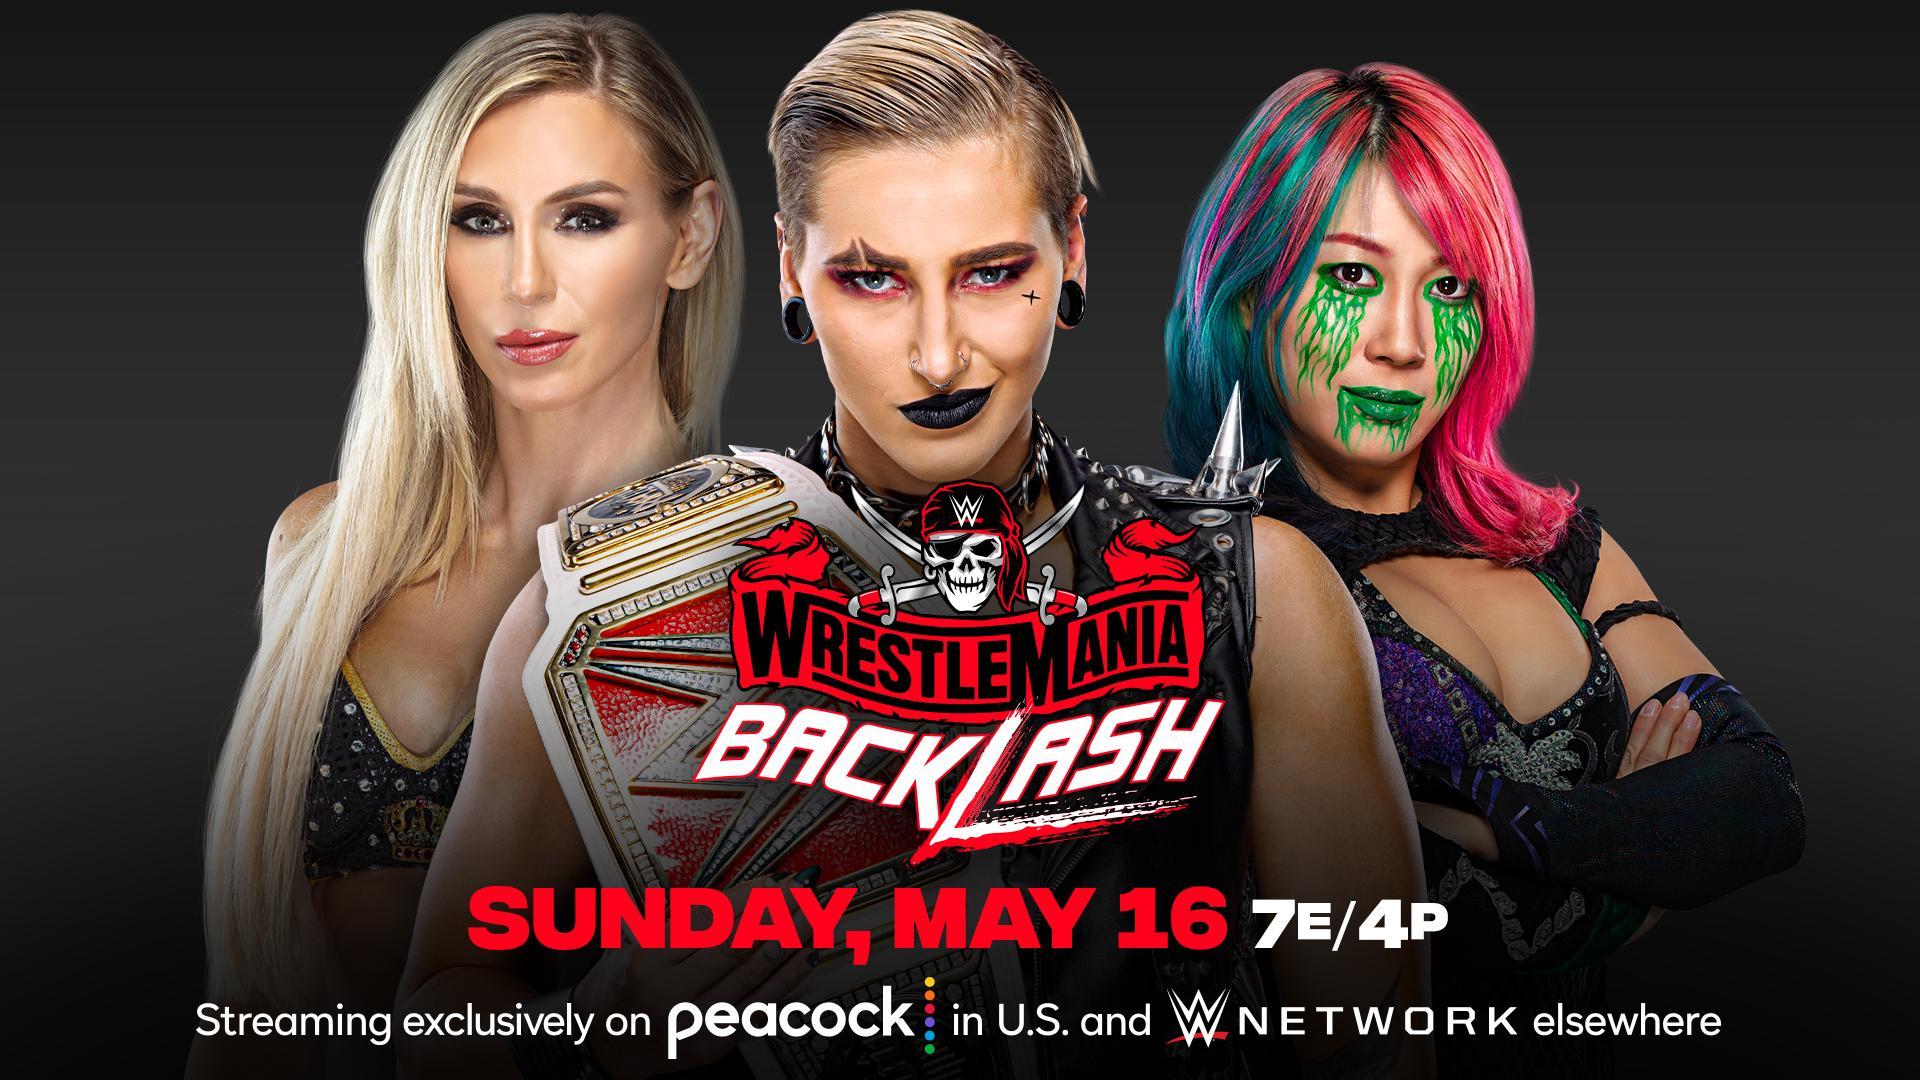 Charlotte Flair entra na luta pelo RAW Women's Championship no WrestleMania Bbacklash